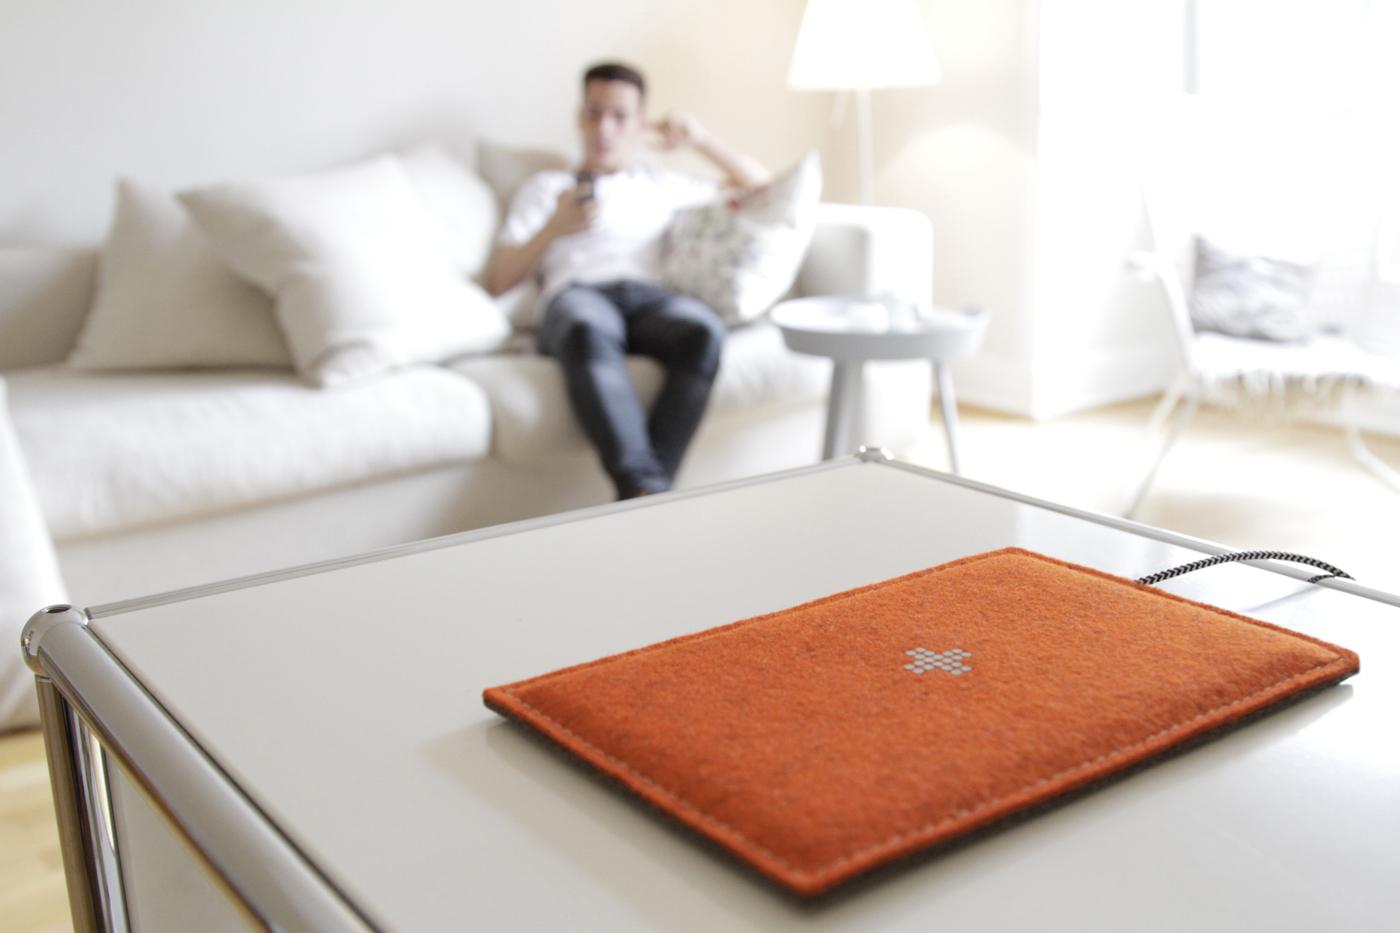 feltboard schicke qi ladestation im filz design gadget rausch. Black Bedroom Furniture Sets. Home Design Ideas